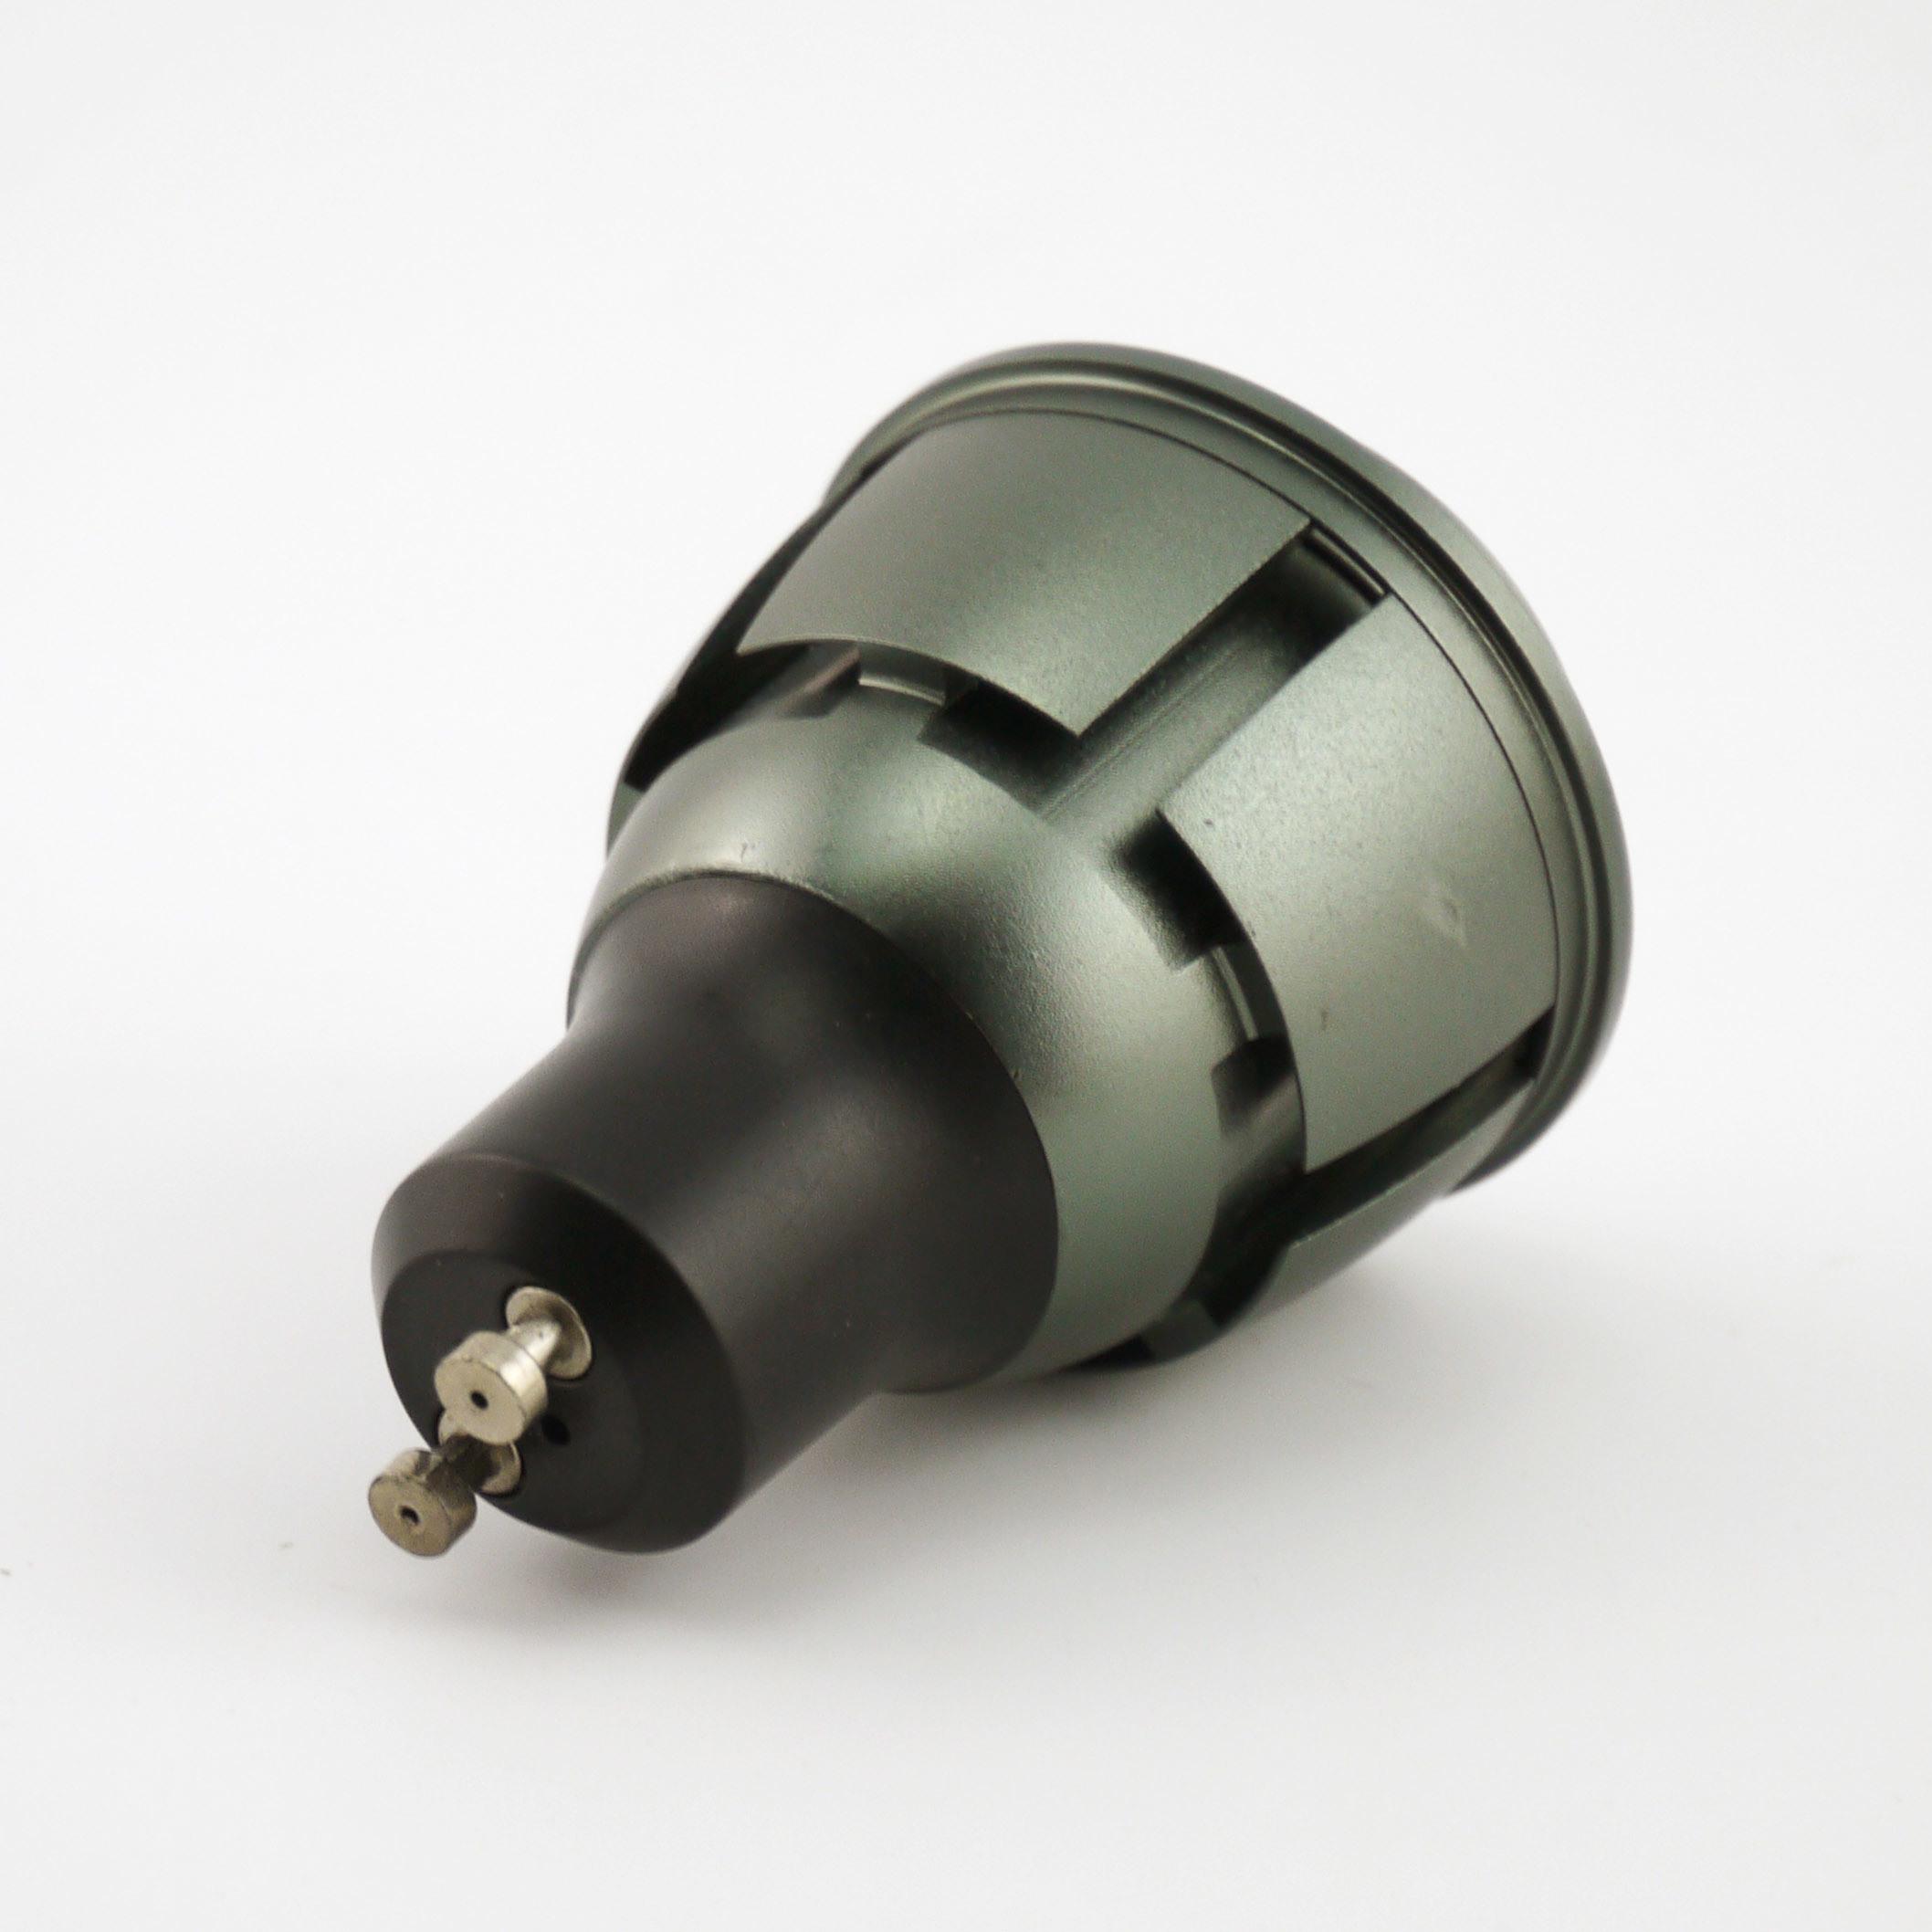 Aluminum 4W COB LED Recessed Spotlight GU10 Bulb